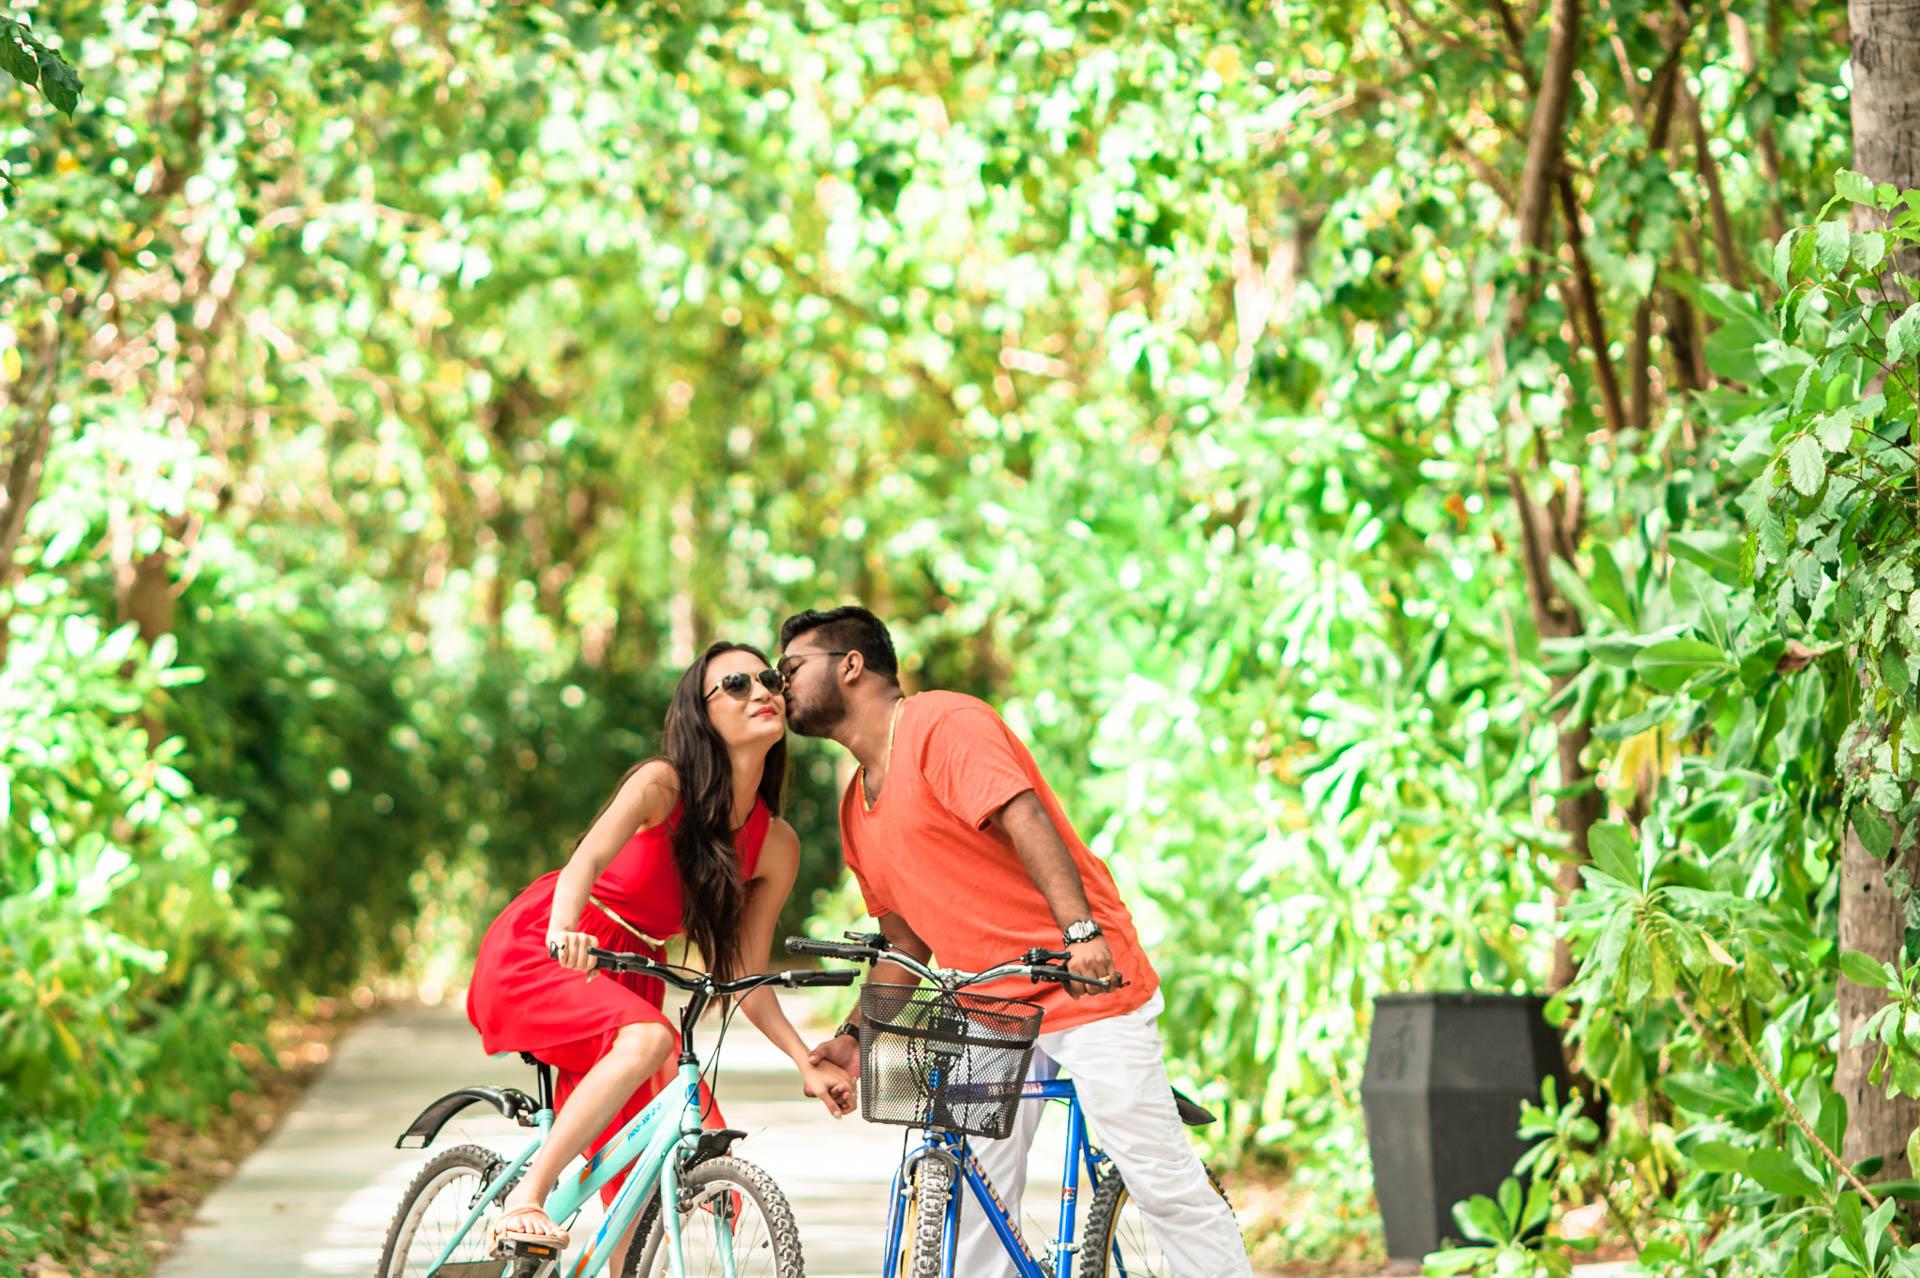 Abhijit Meghna Romantic Vacation in Maldives 25